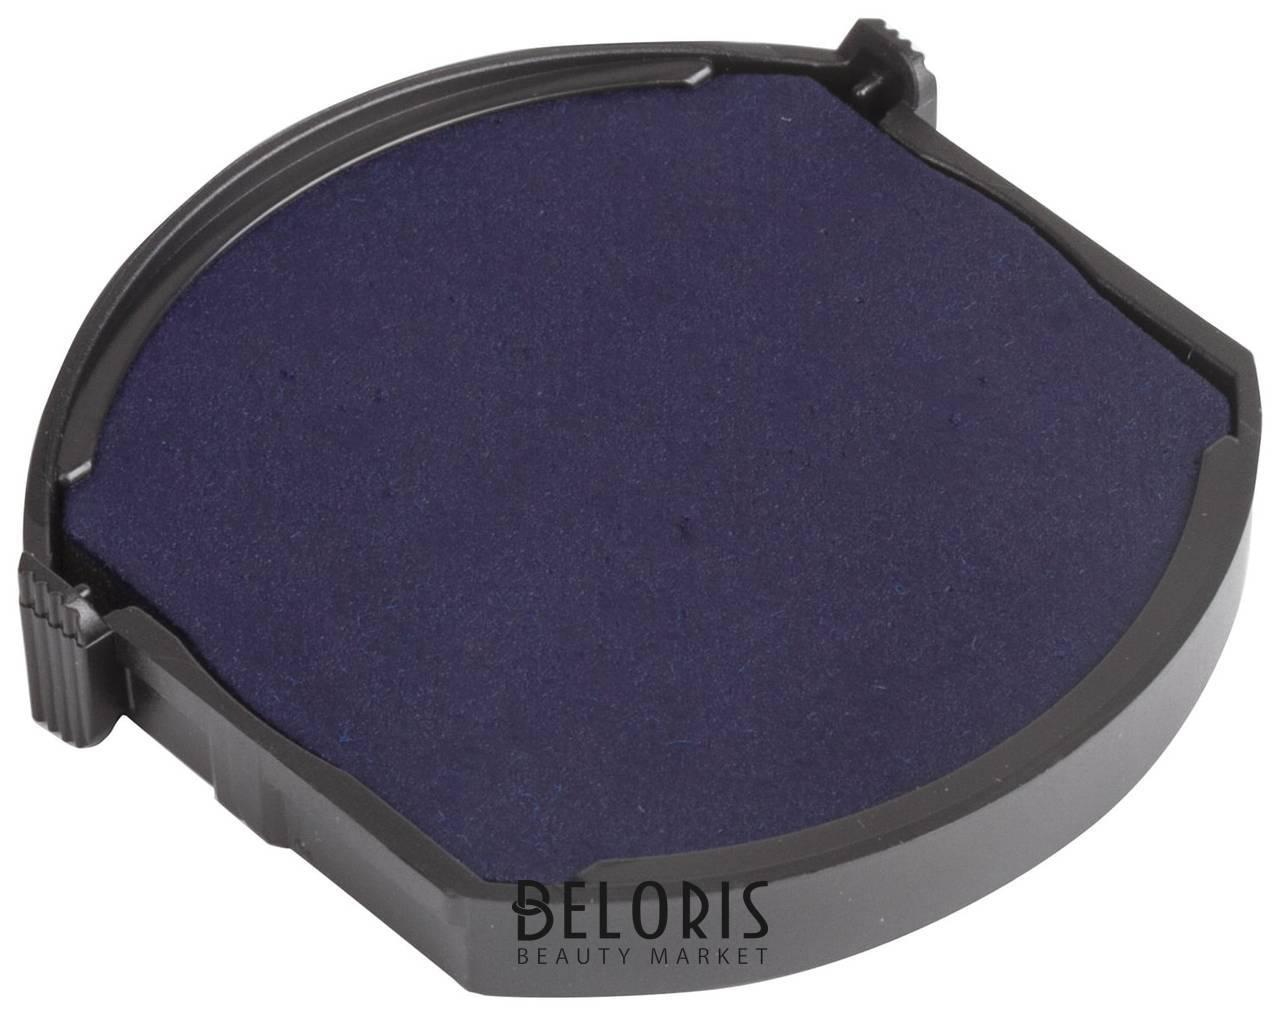 Подушка сменная для печатей диаметром 42 мм, для Trodat 4642, синяя Trodat